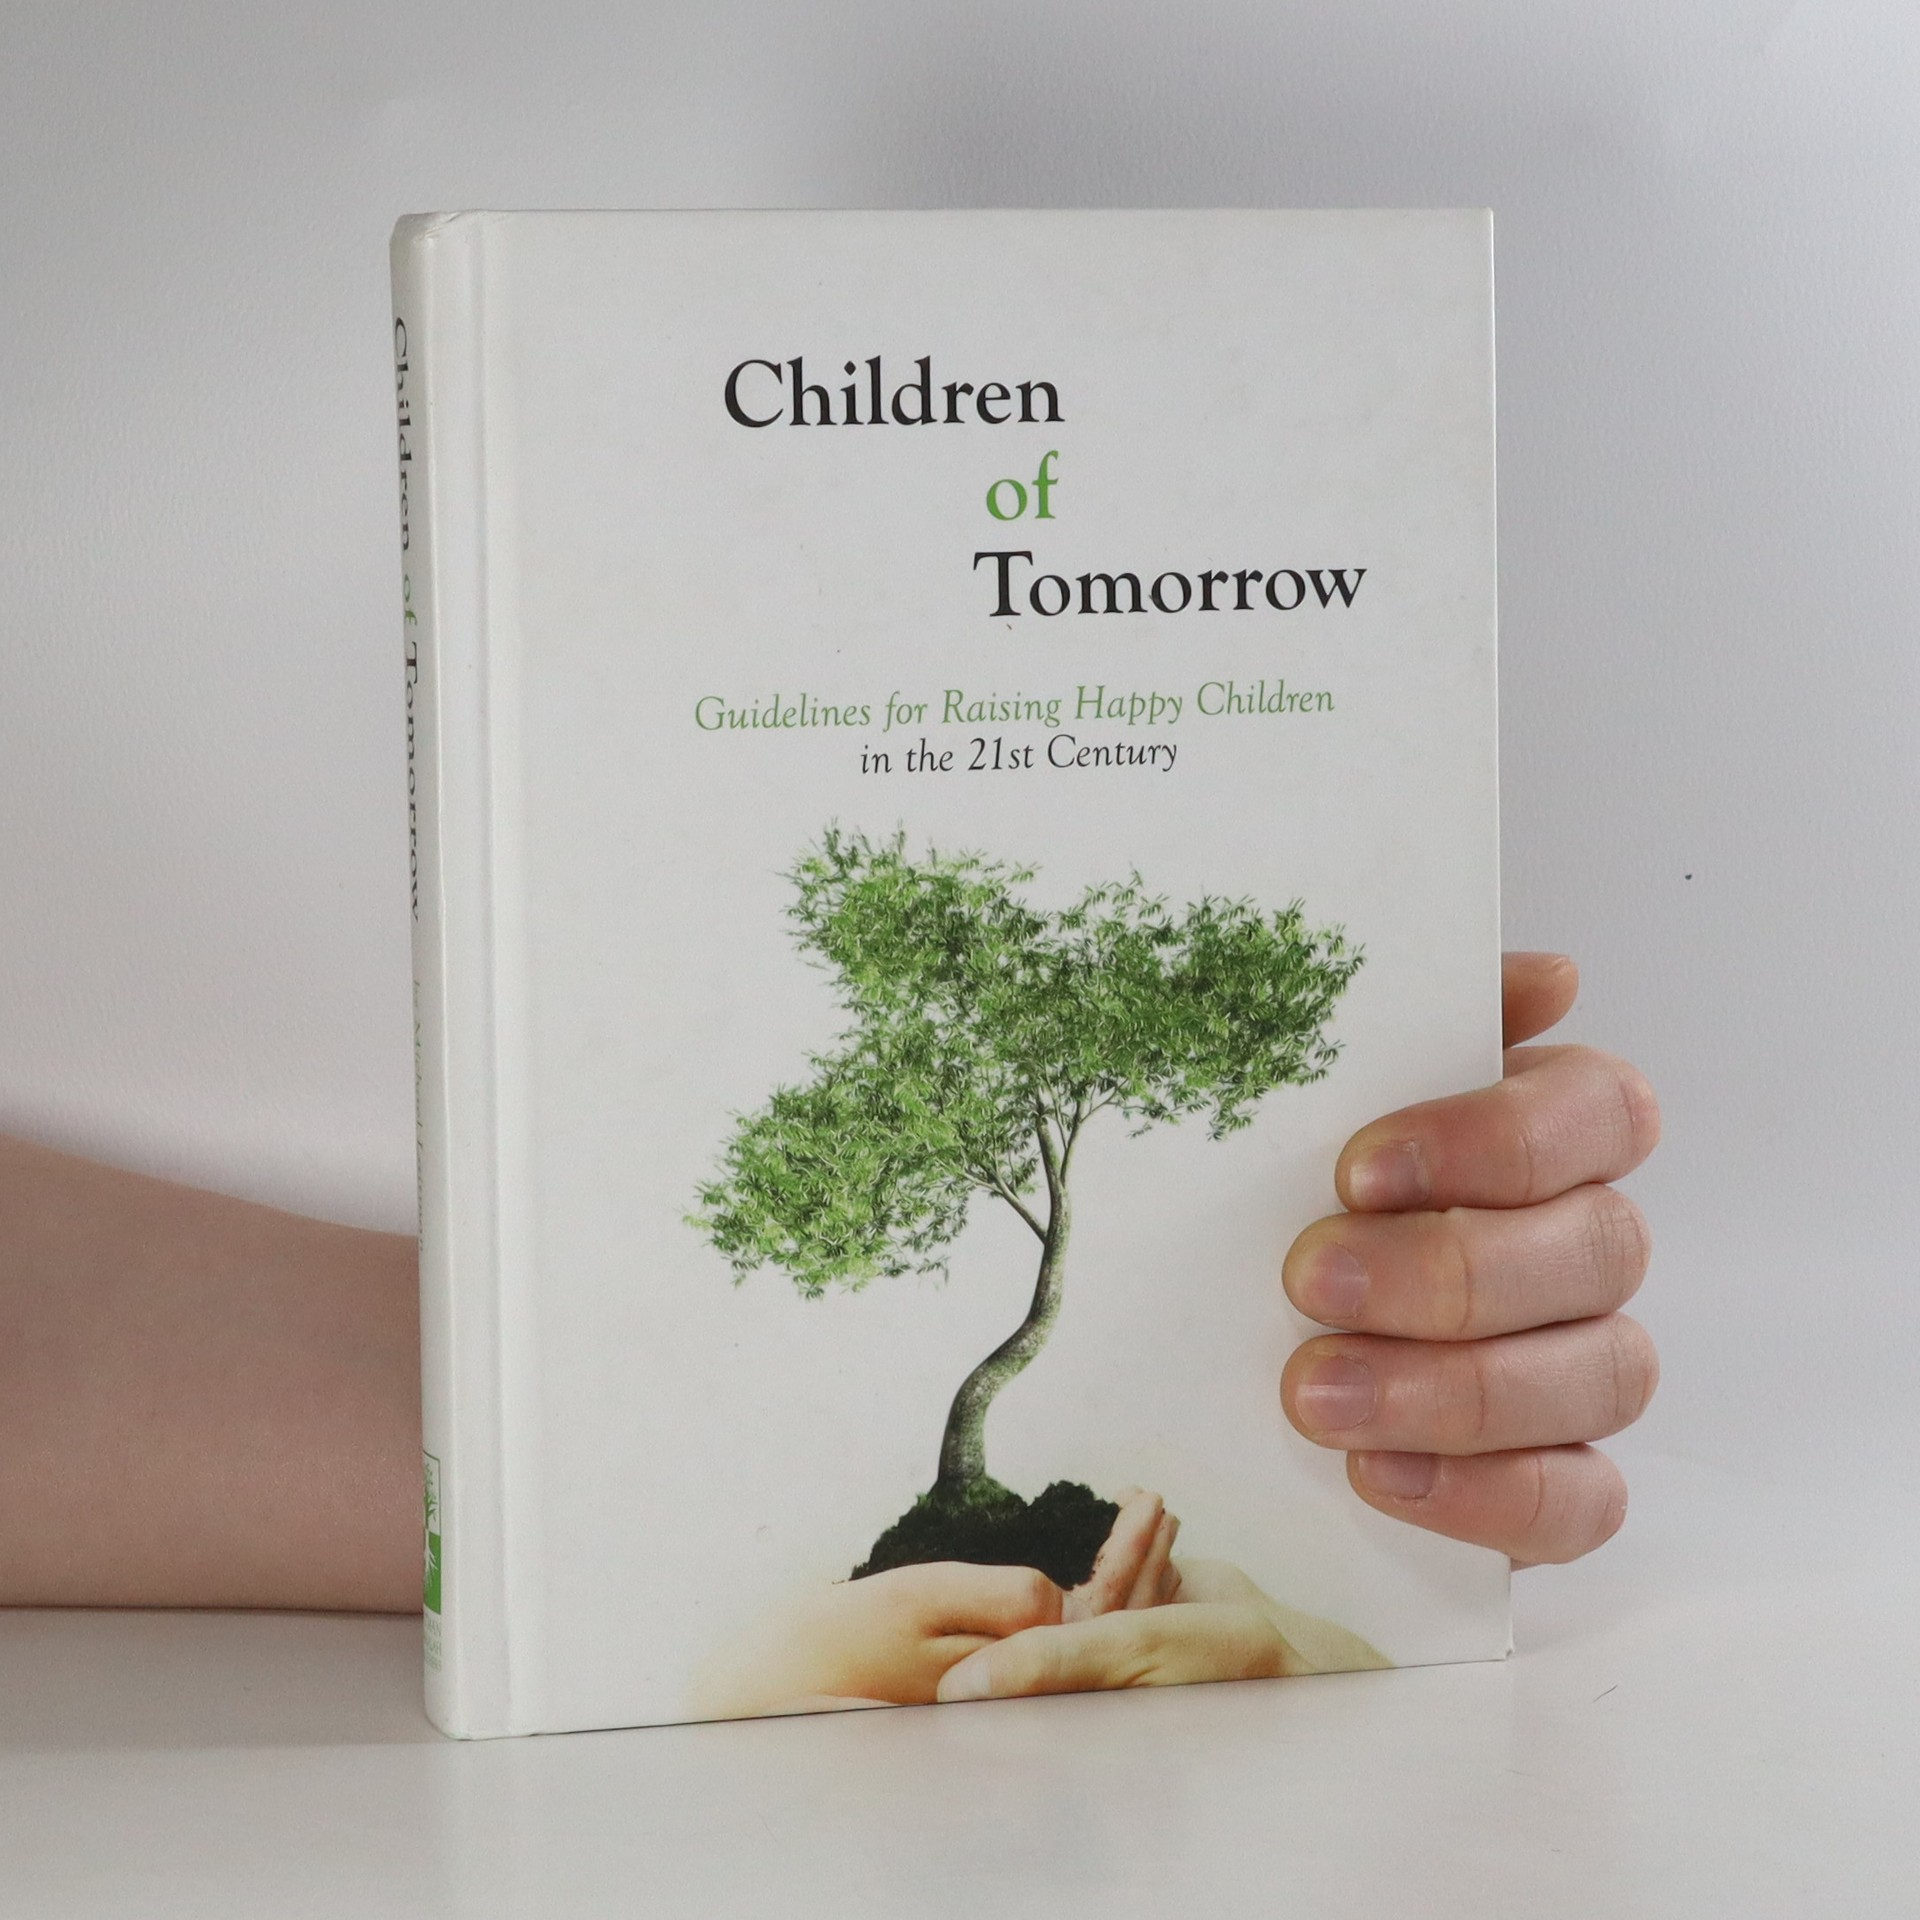 antikvární kniha Children of Tomorrow, 2011